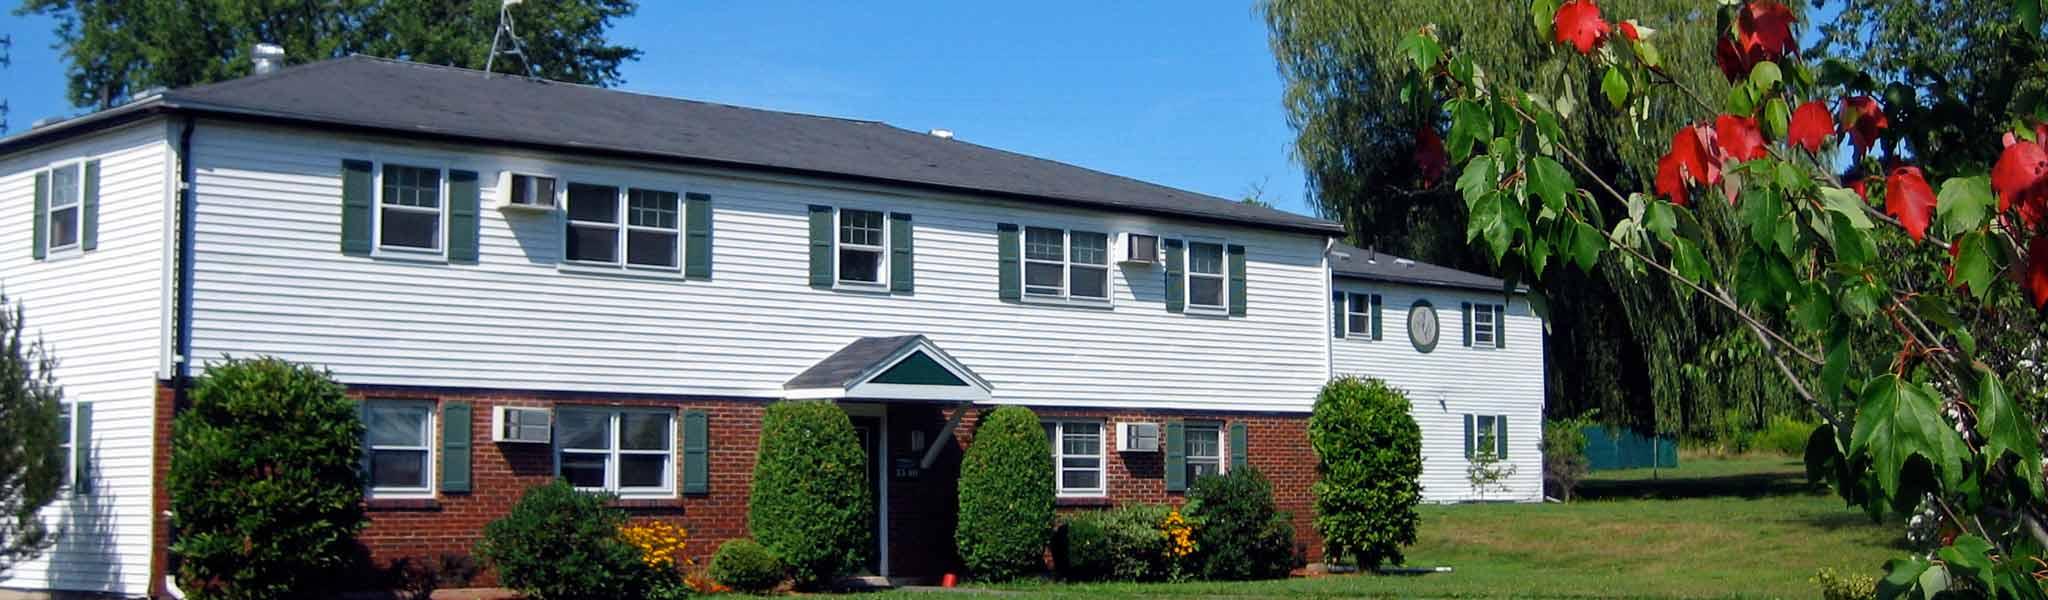 amherst ma apartments for rent aspen square management. Black Bedroom Furniture Sets. Home Design Ideas